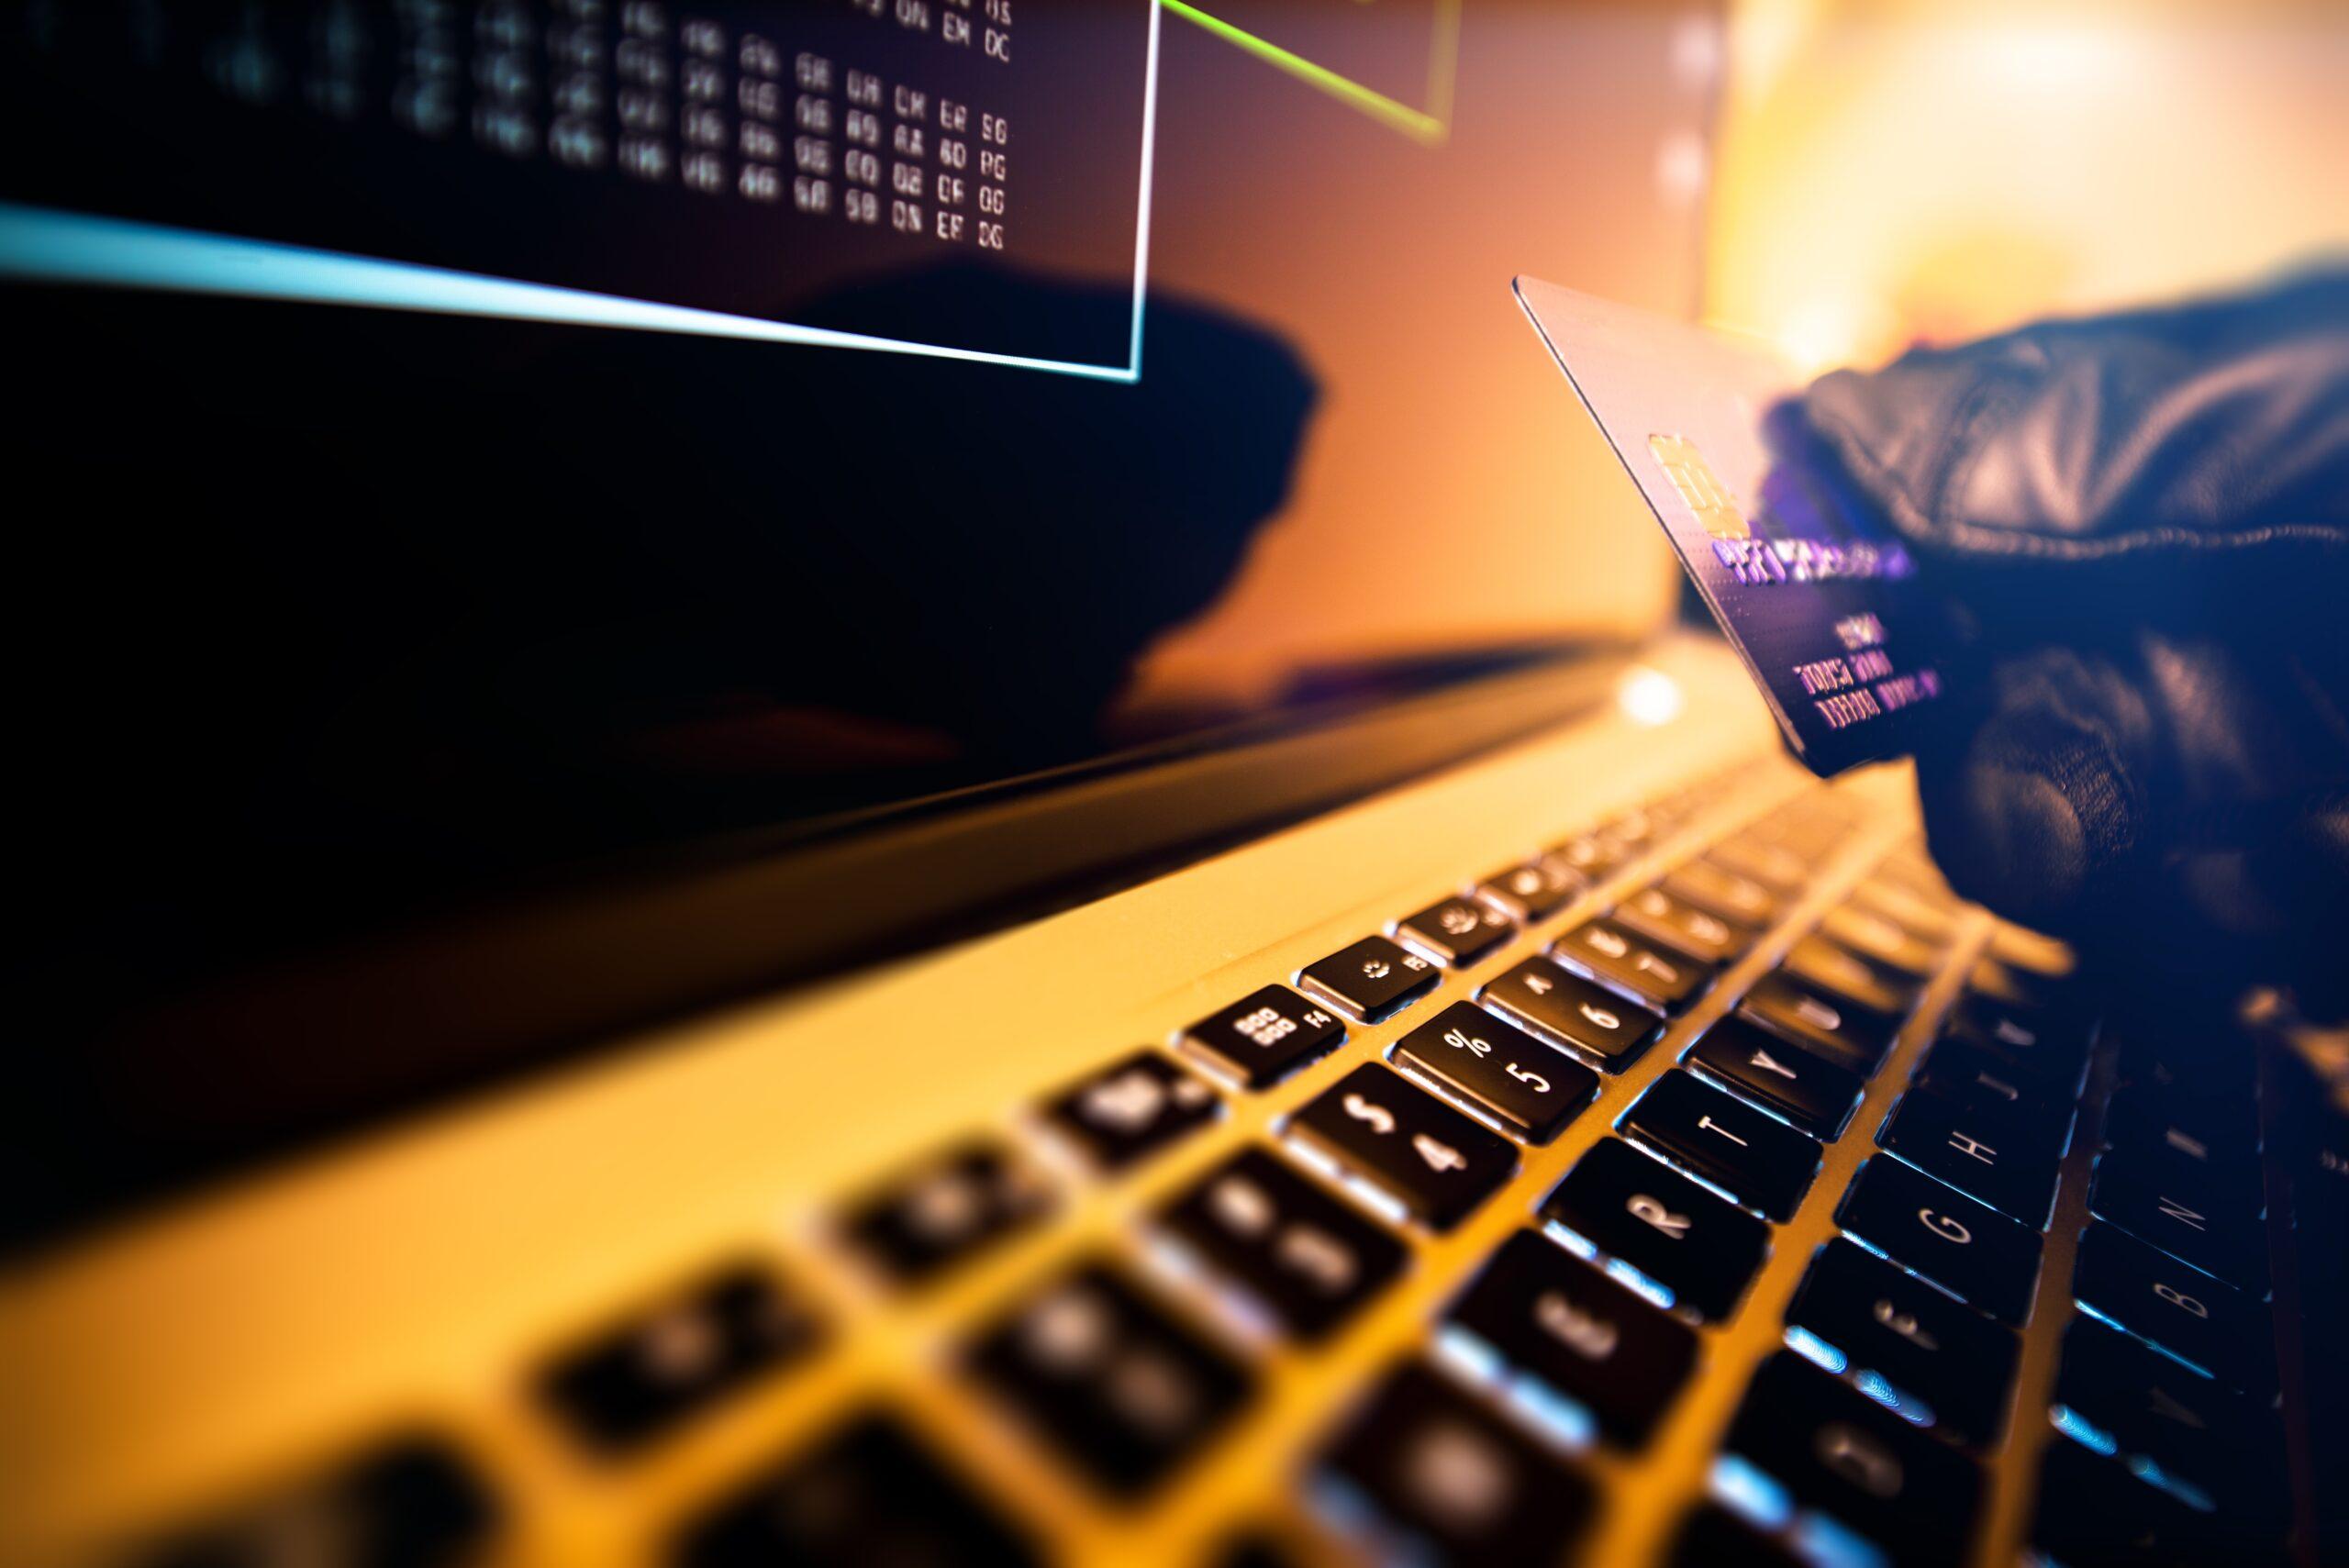 Texas Cracks Down on COVID-19 Identity Theft Complaints